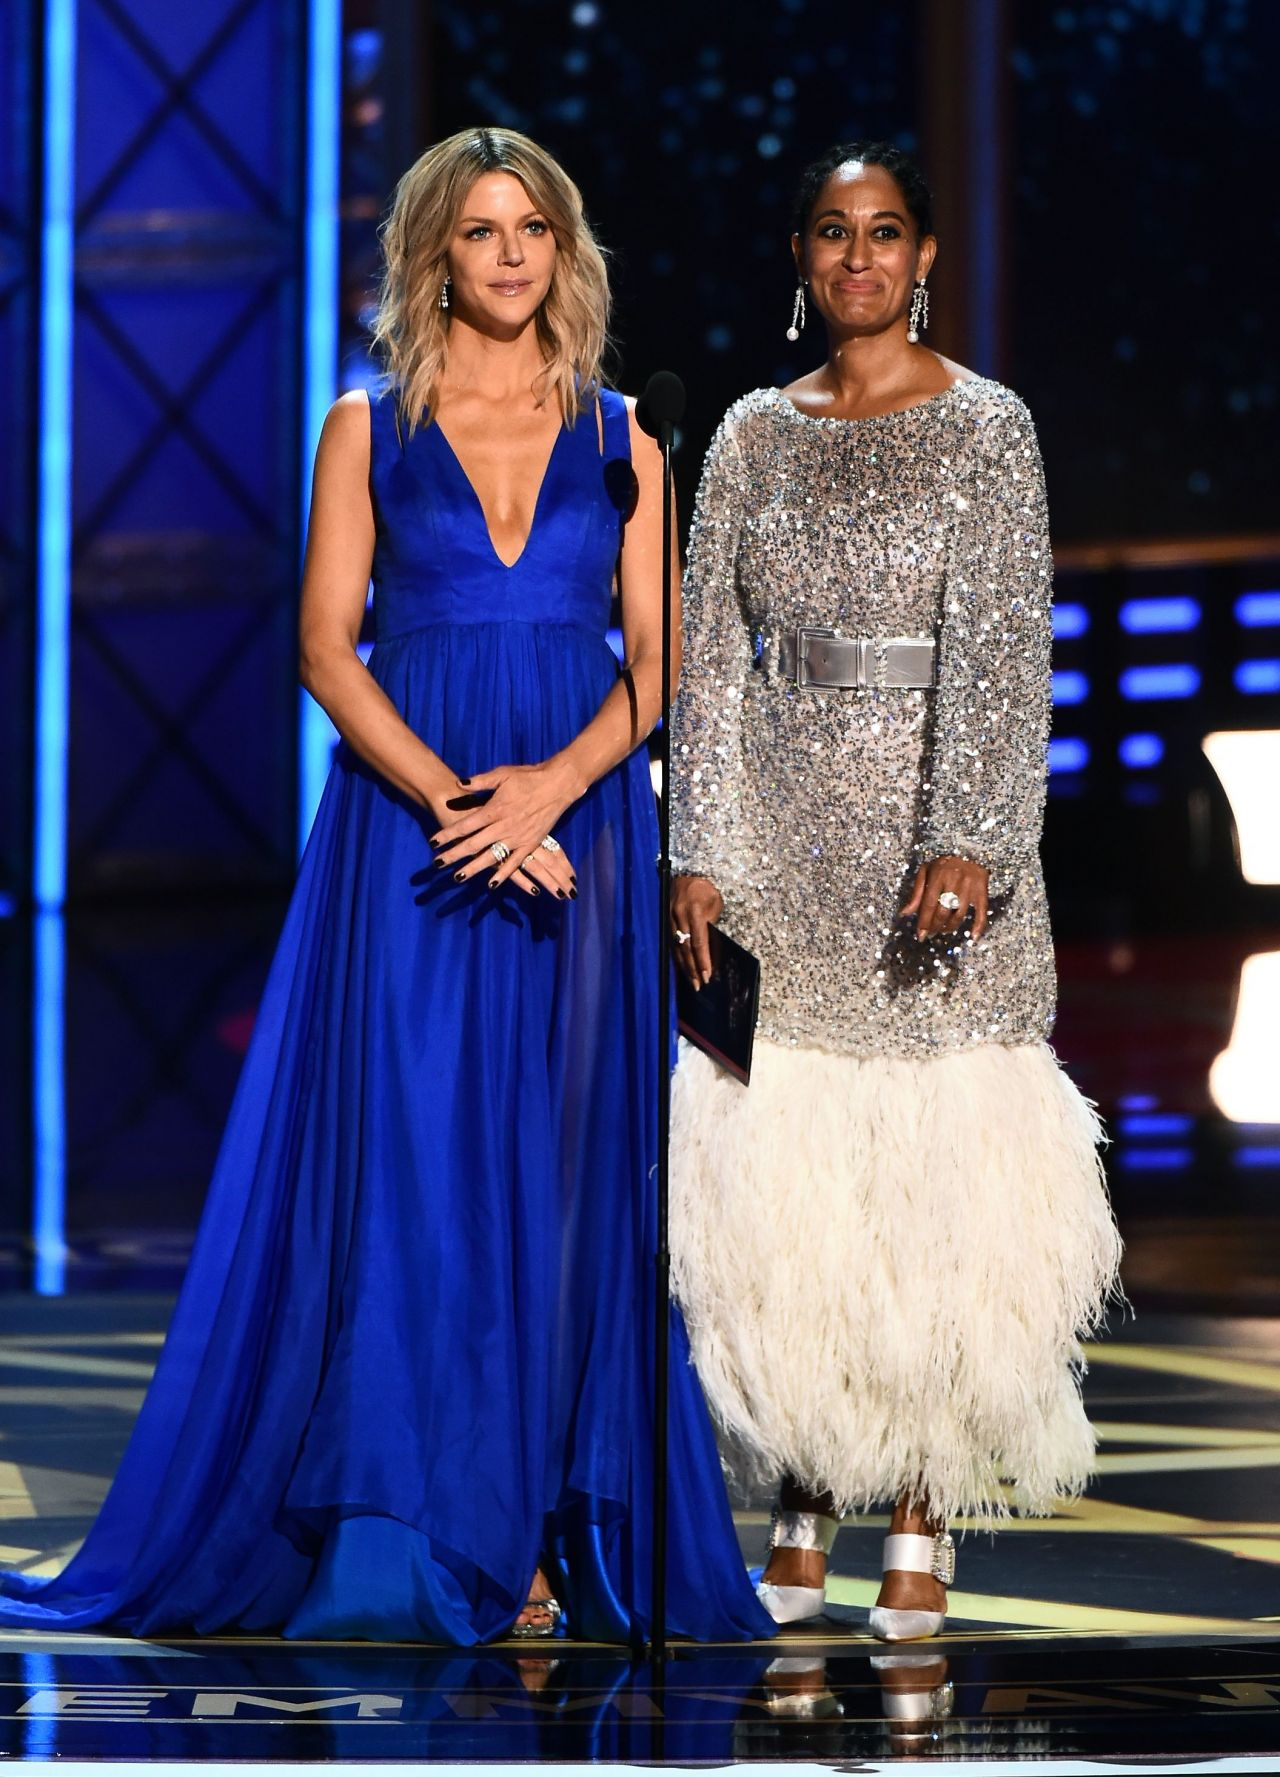 Kaitlin olson emmy awards in los angeles